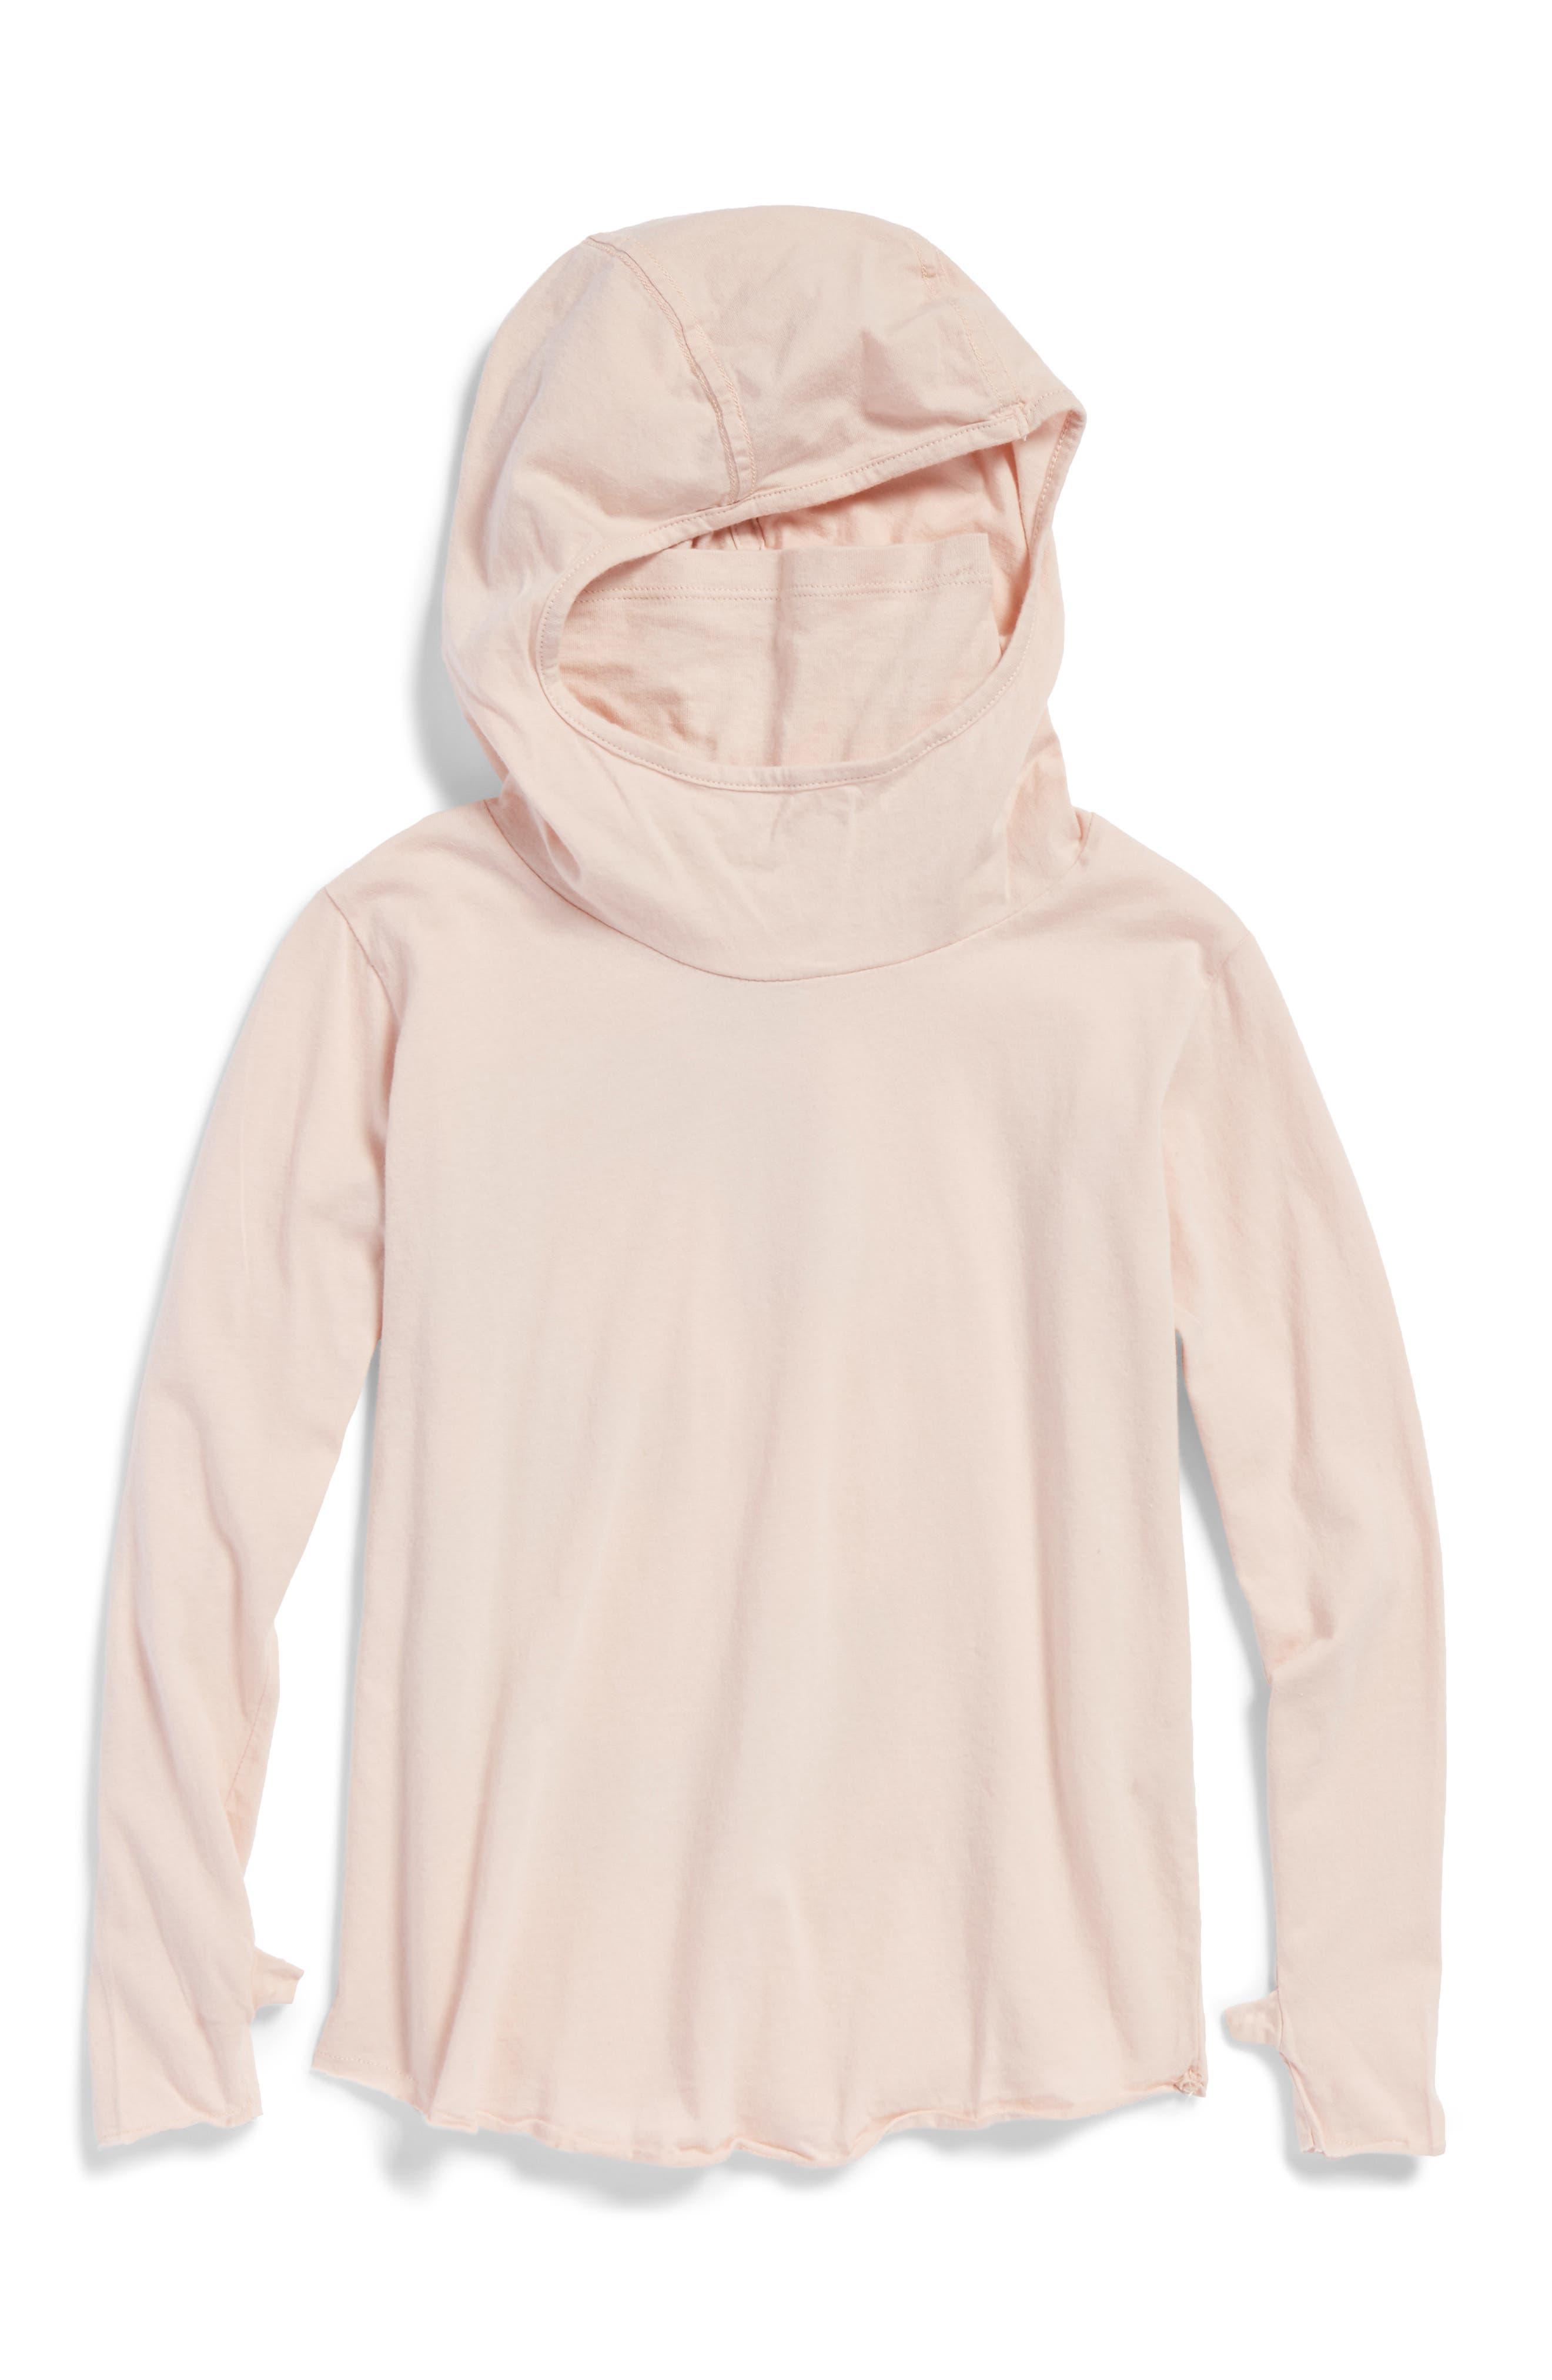 Numbered Ninja Shirt,                         Main,                         color, 680